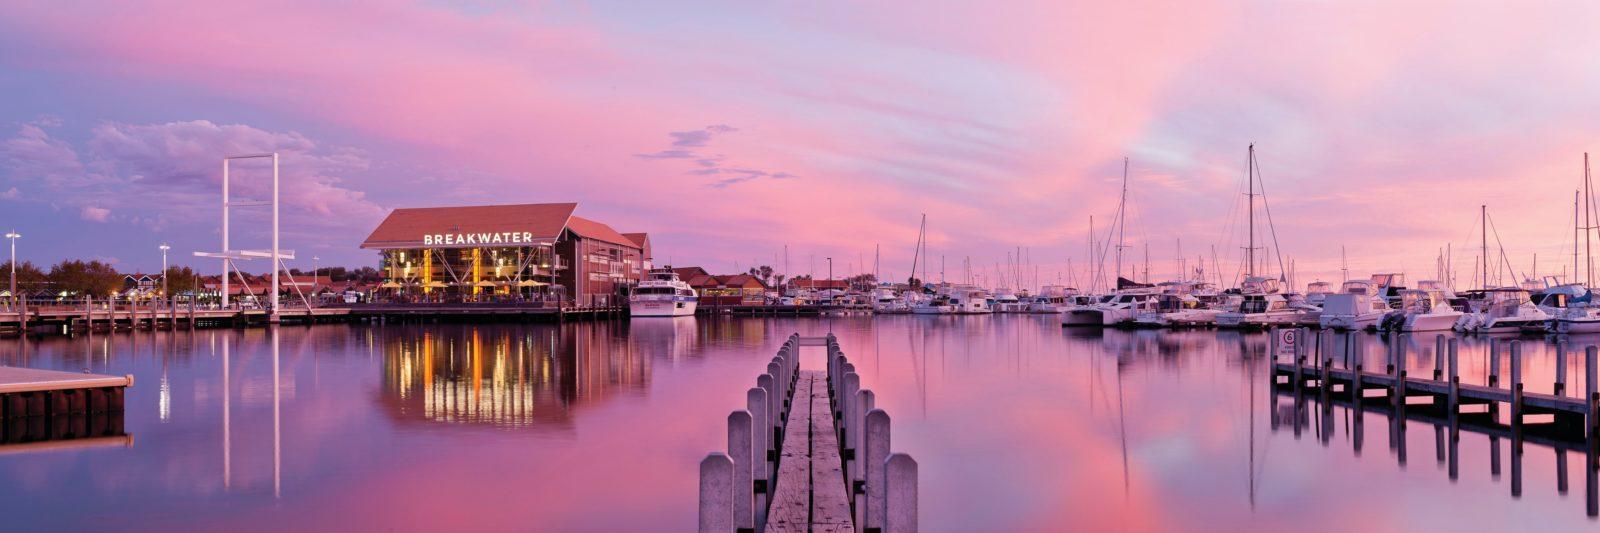 Sorrento Beach, Hillarys, Western Australia